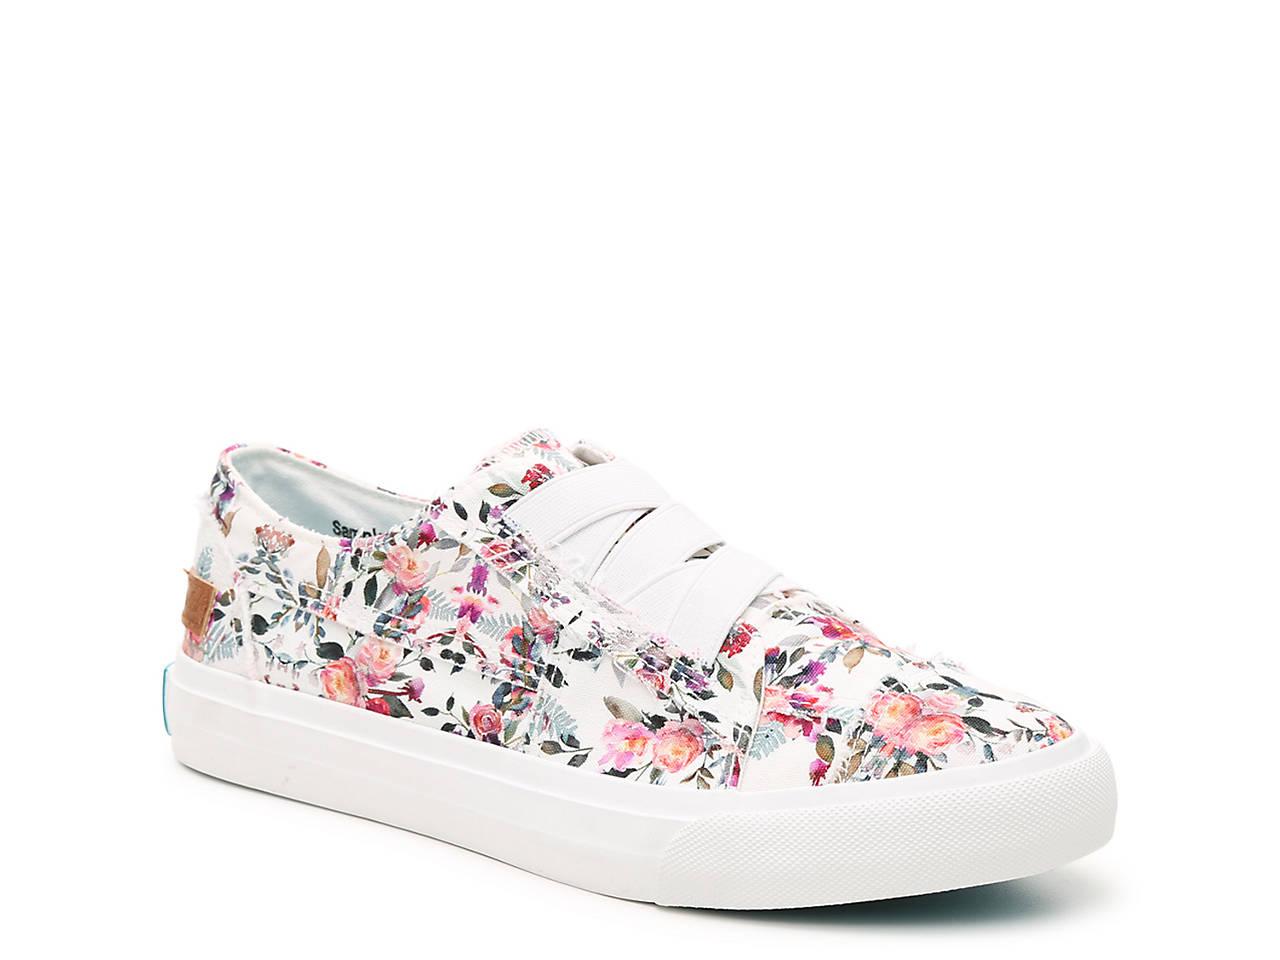 Marley Slip-On Sneaker